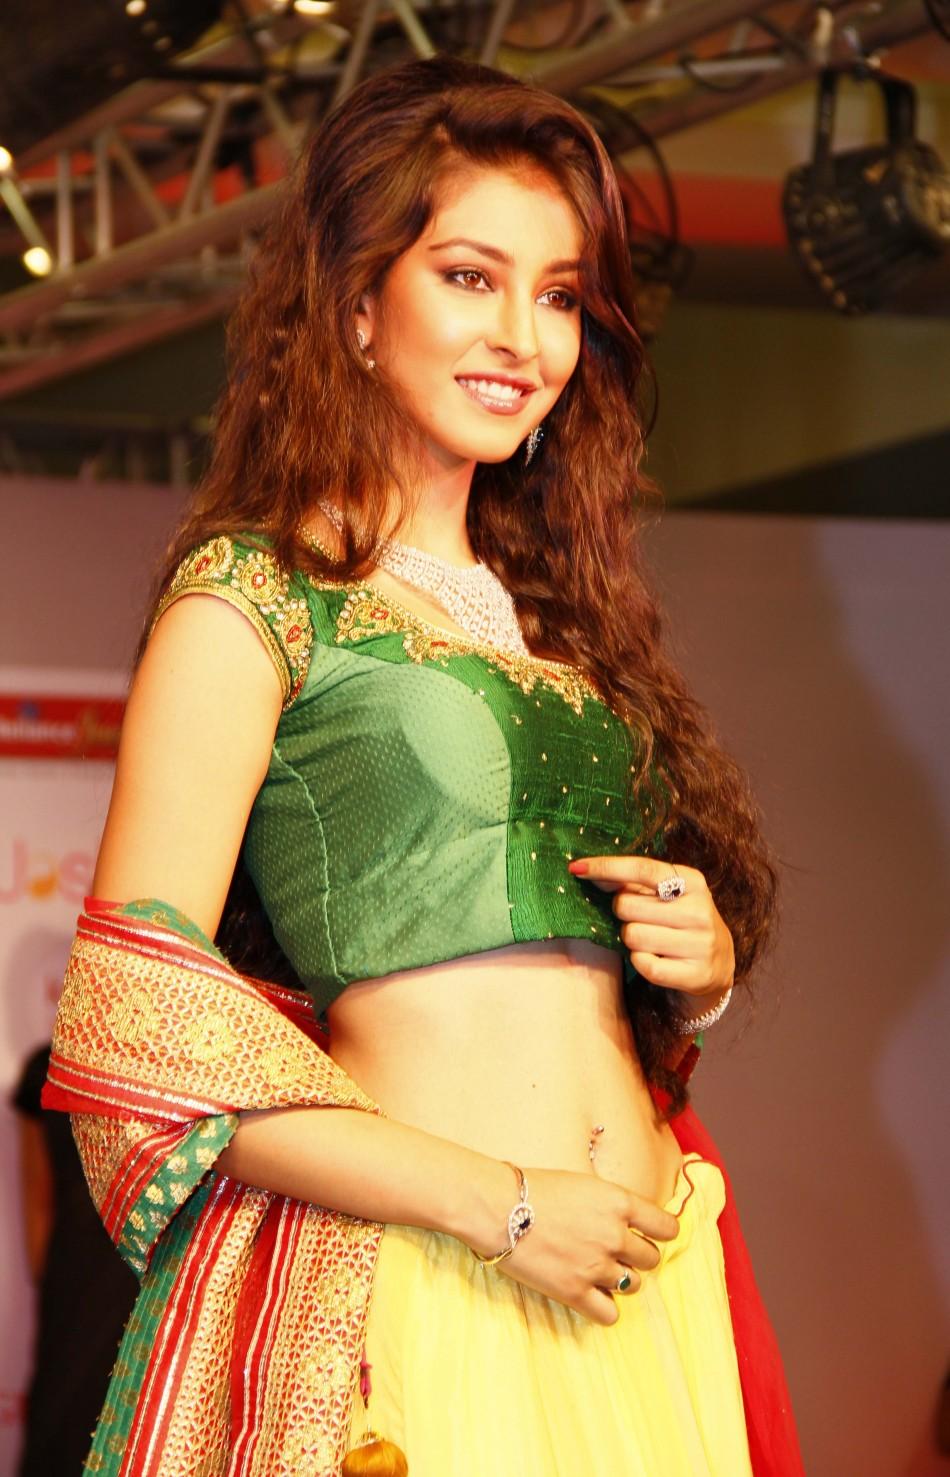 Pawan Kalyan To Romance Miss India World 2013 Navneet Kaur